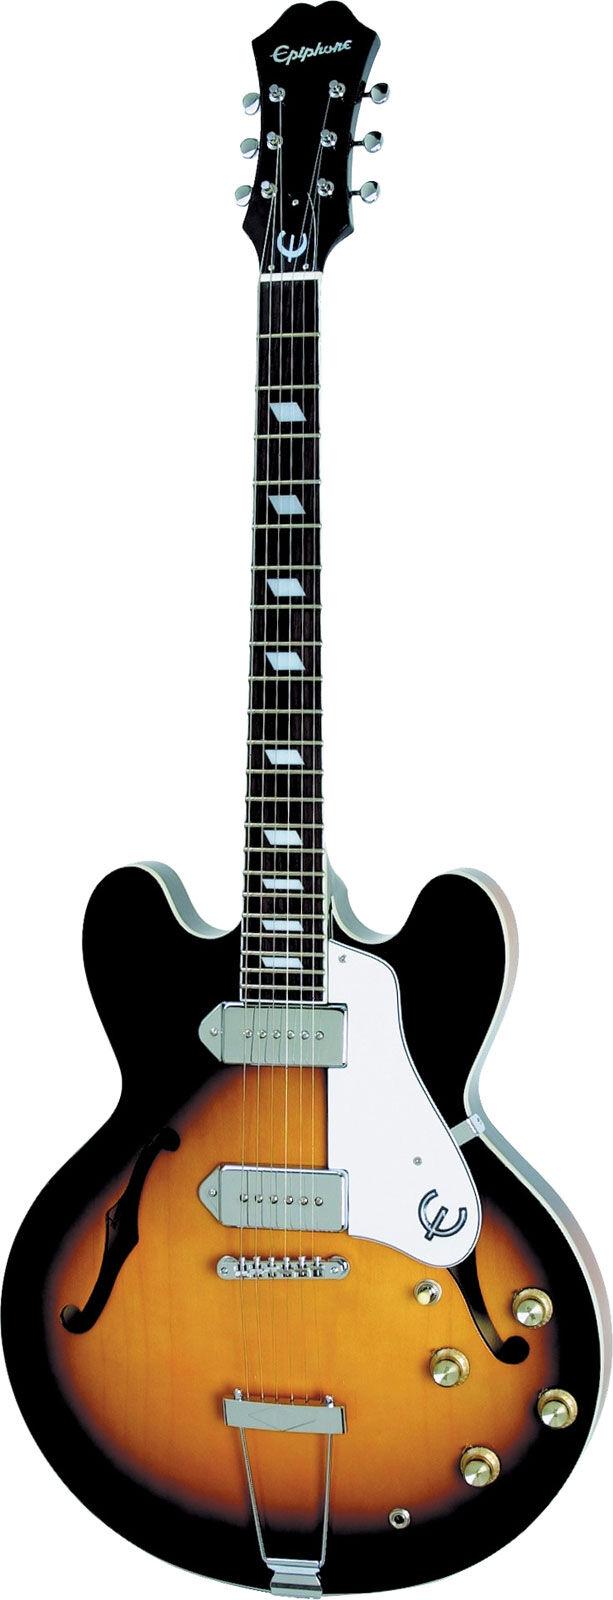 Fender casino